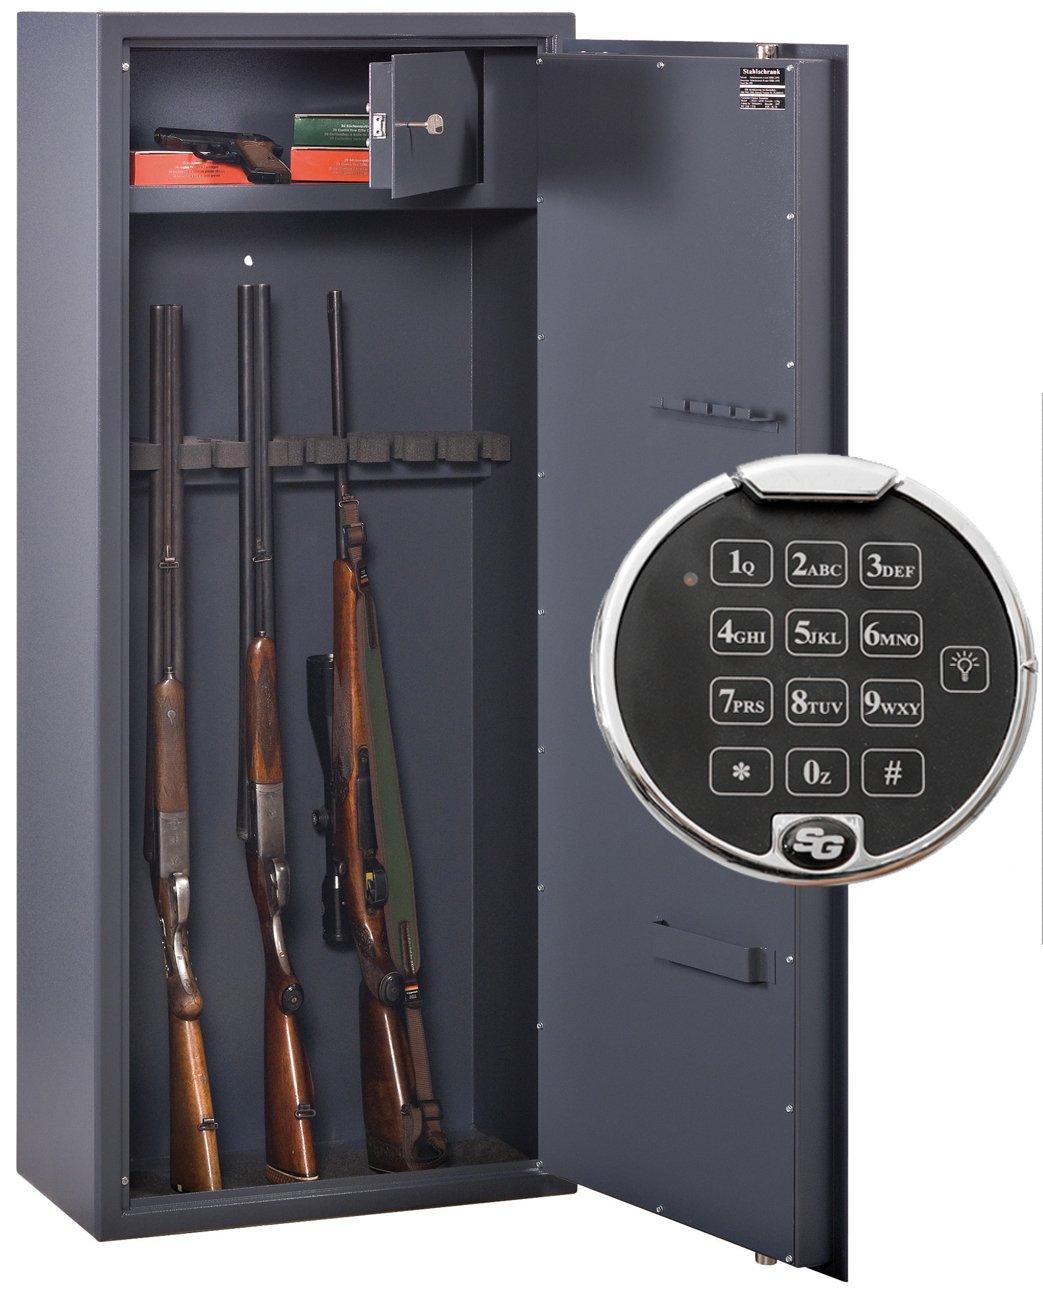 Waffenschrank Format WF 1500-10 Elo (1500x600x335mm) 10 ...